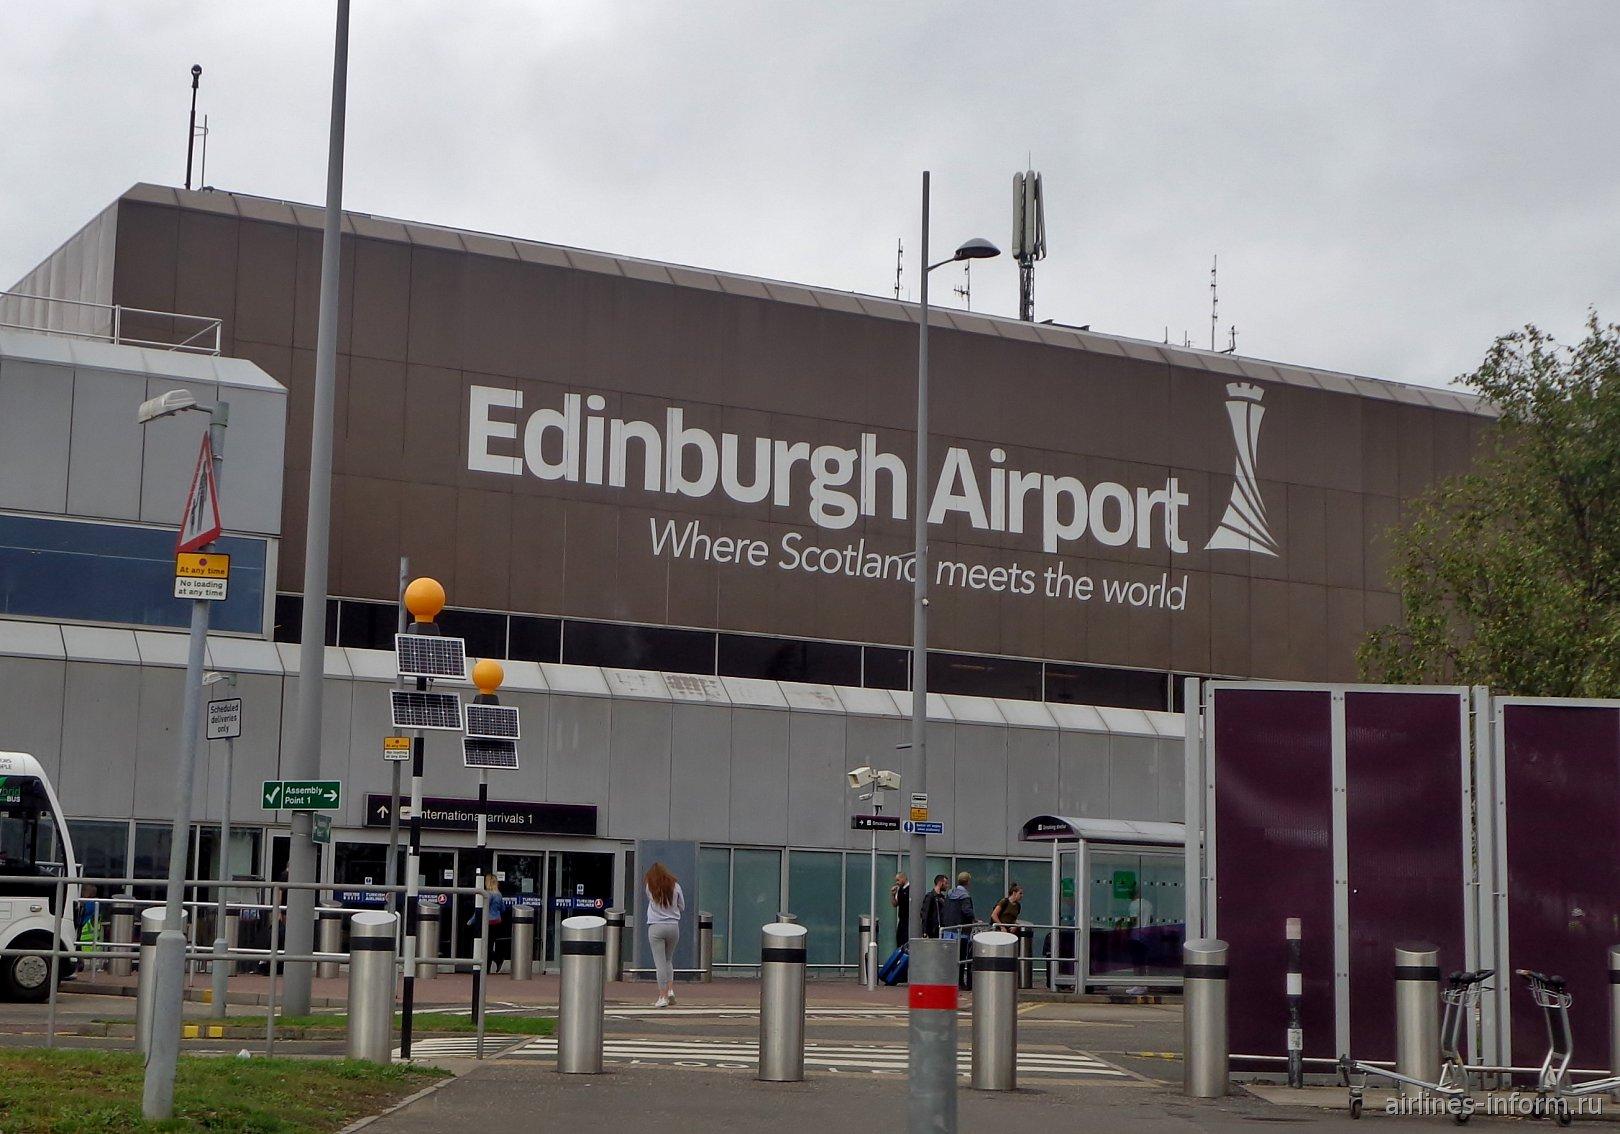 У входа в аэропорт Эдинбург